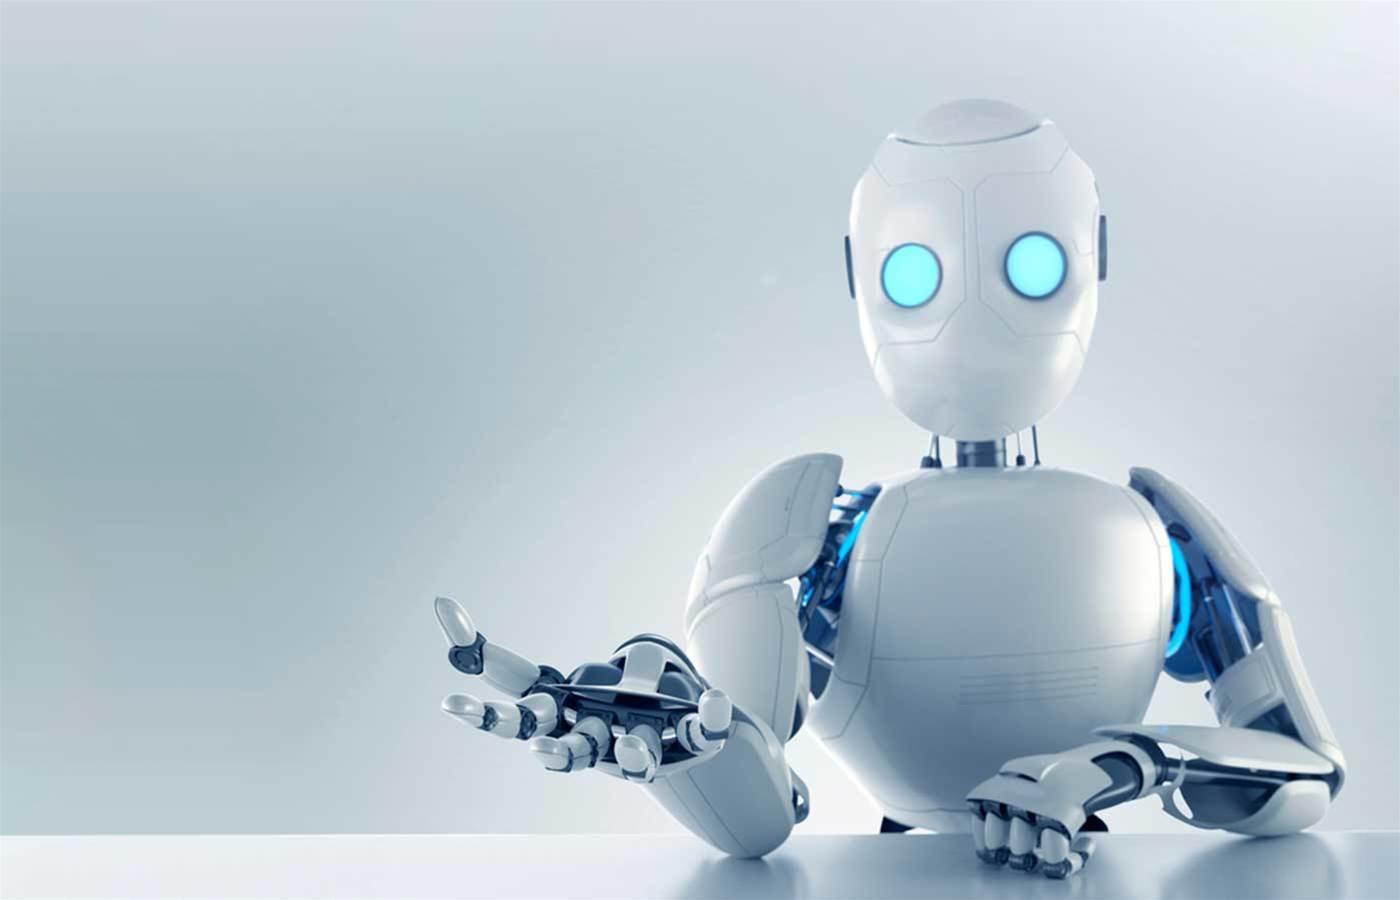 Chatbot uptake to surge over next two years: Gartner